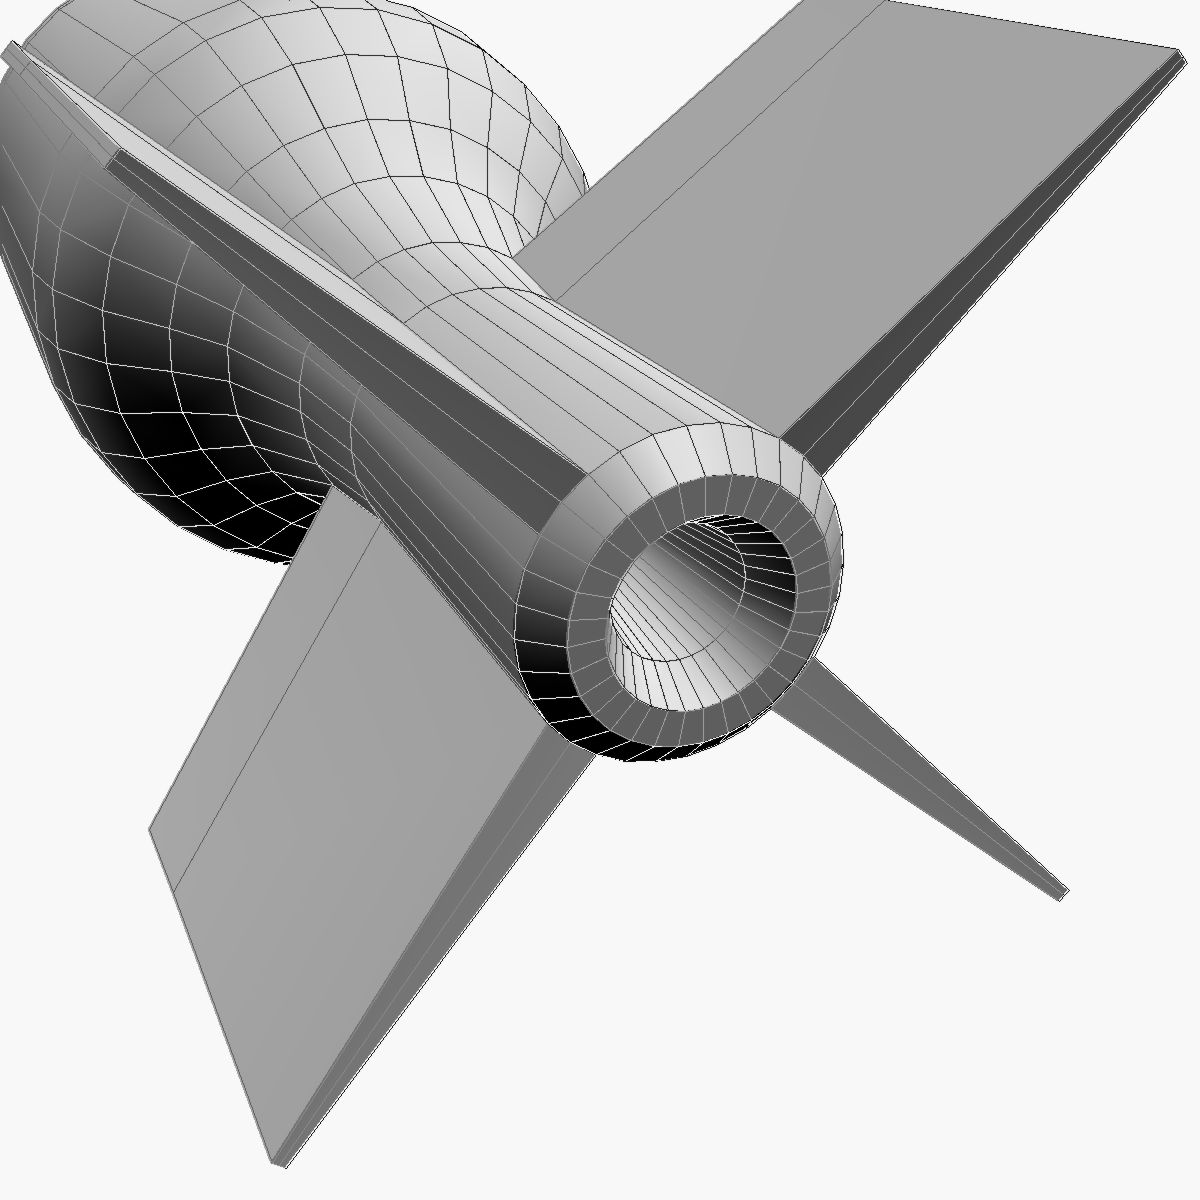 Bomb, Jolly Roger scheme 3d model 3ds dxf fbx blend cob dae X obj 162682